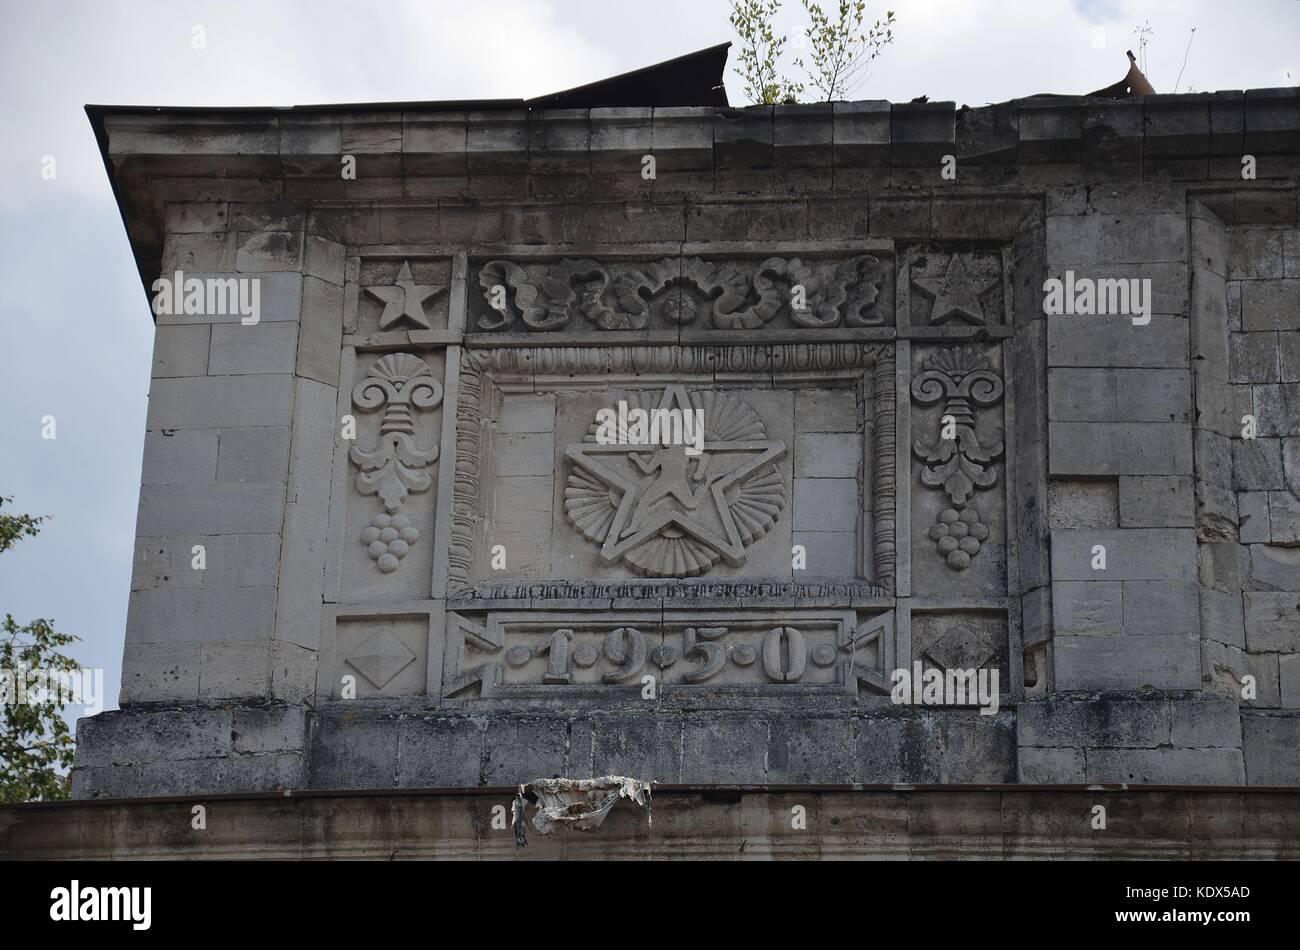 Detail des ehemaligen Dinamo-Stadions in Chişinău, Hauptstadt der Republik Moldau - Stock Image